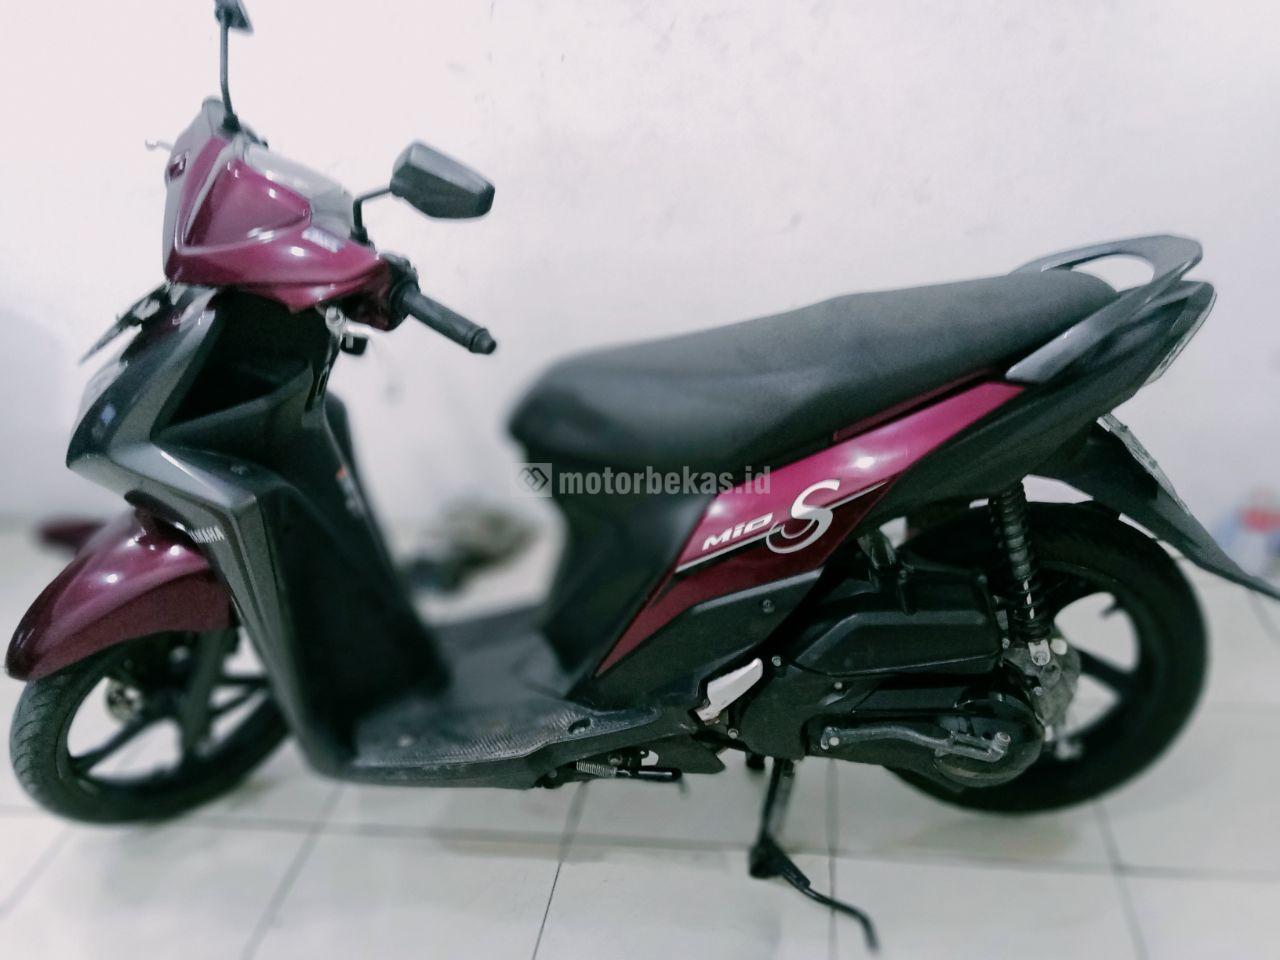 YAMAHA MIO S  2870 motorbekas.id